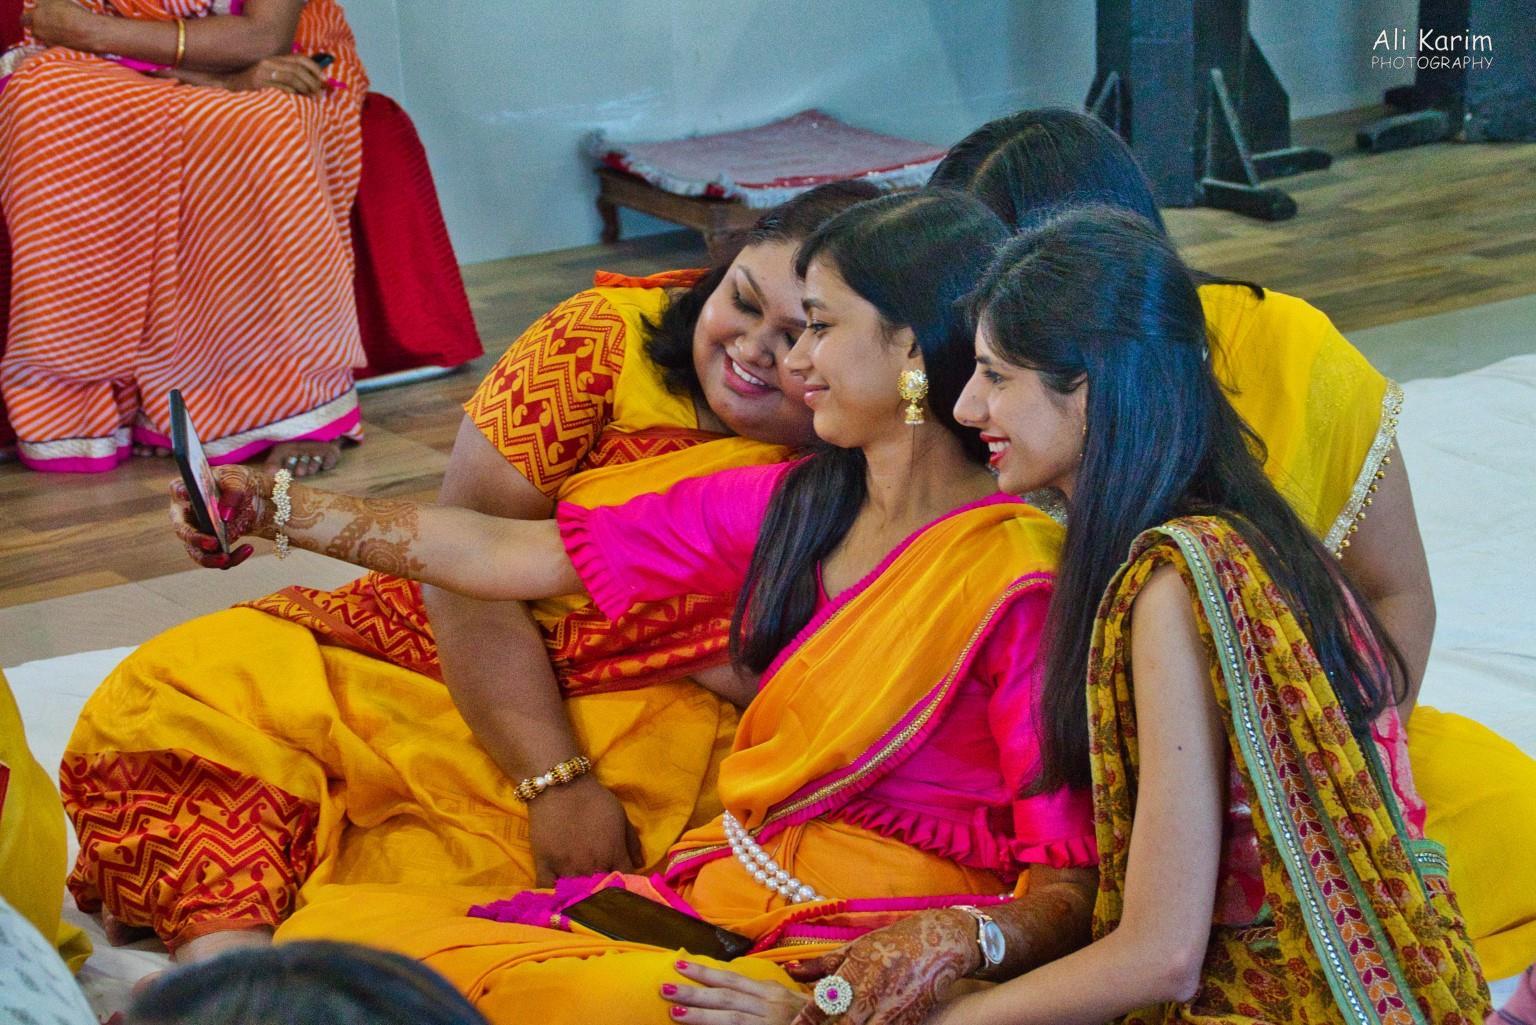 Bikaner, Rajasthan Selfie time